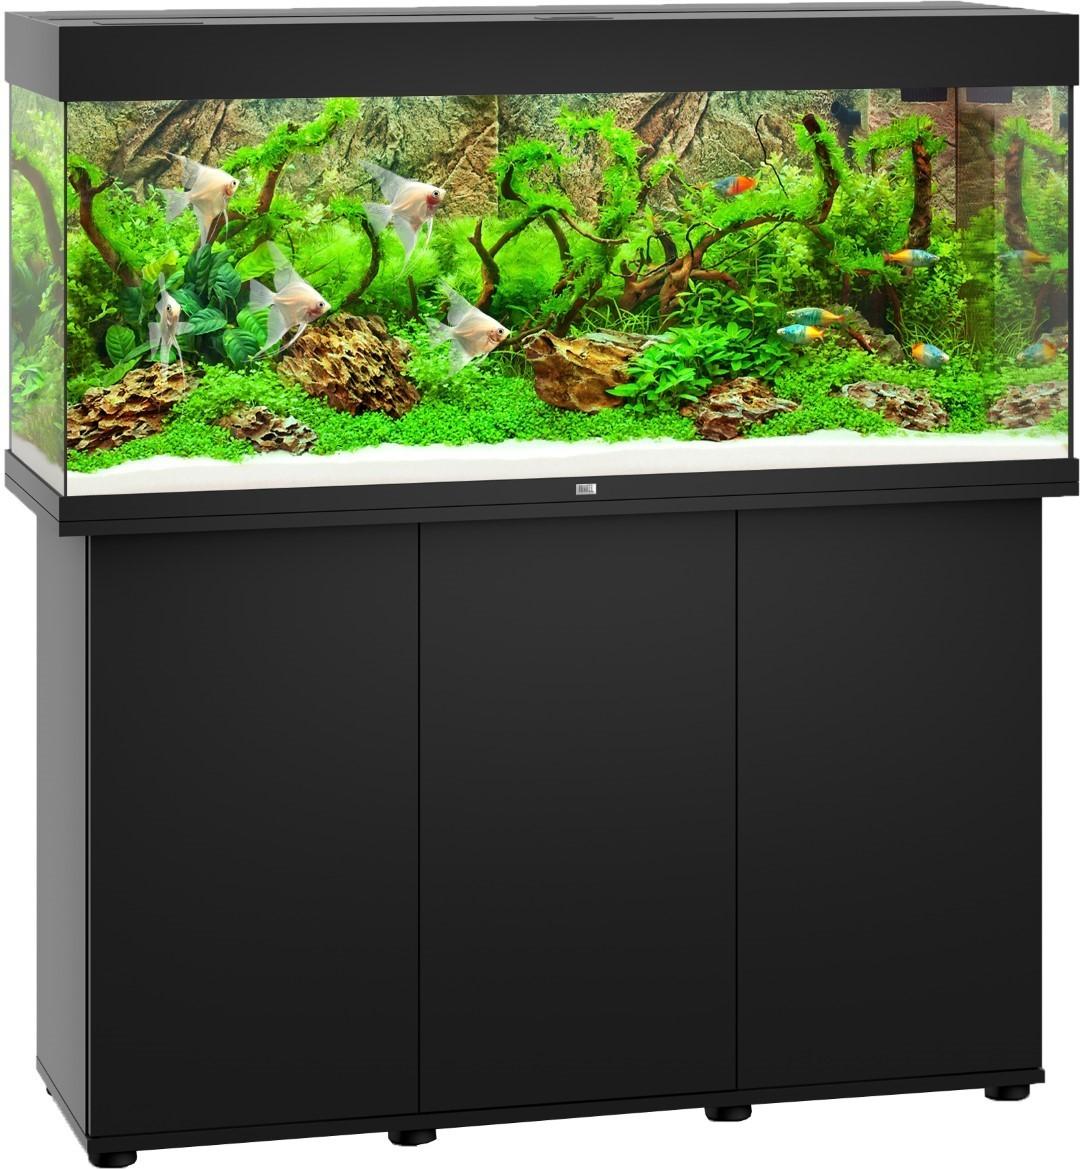 Juwel meubel bouwpakket SBX Rio 240 zwart